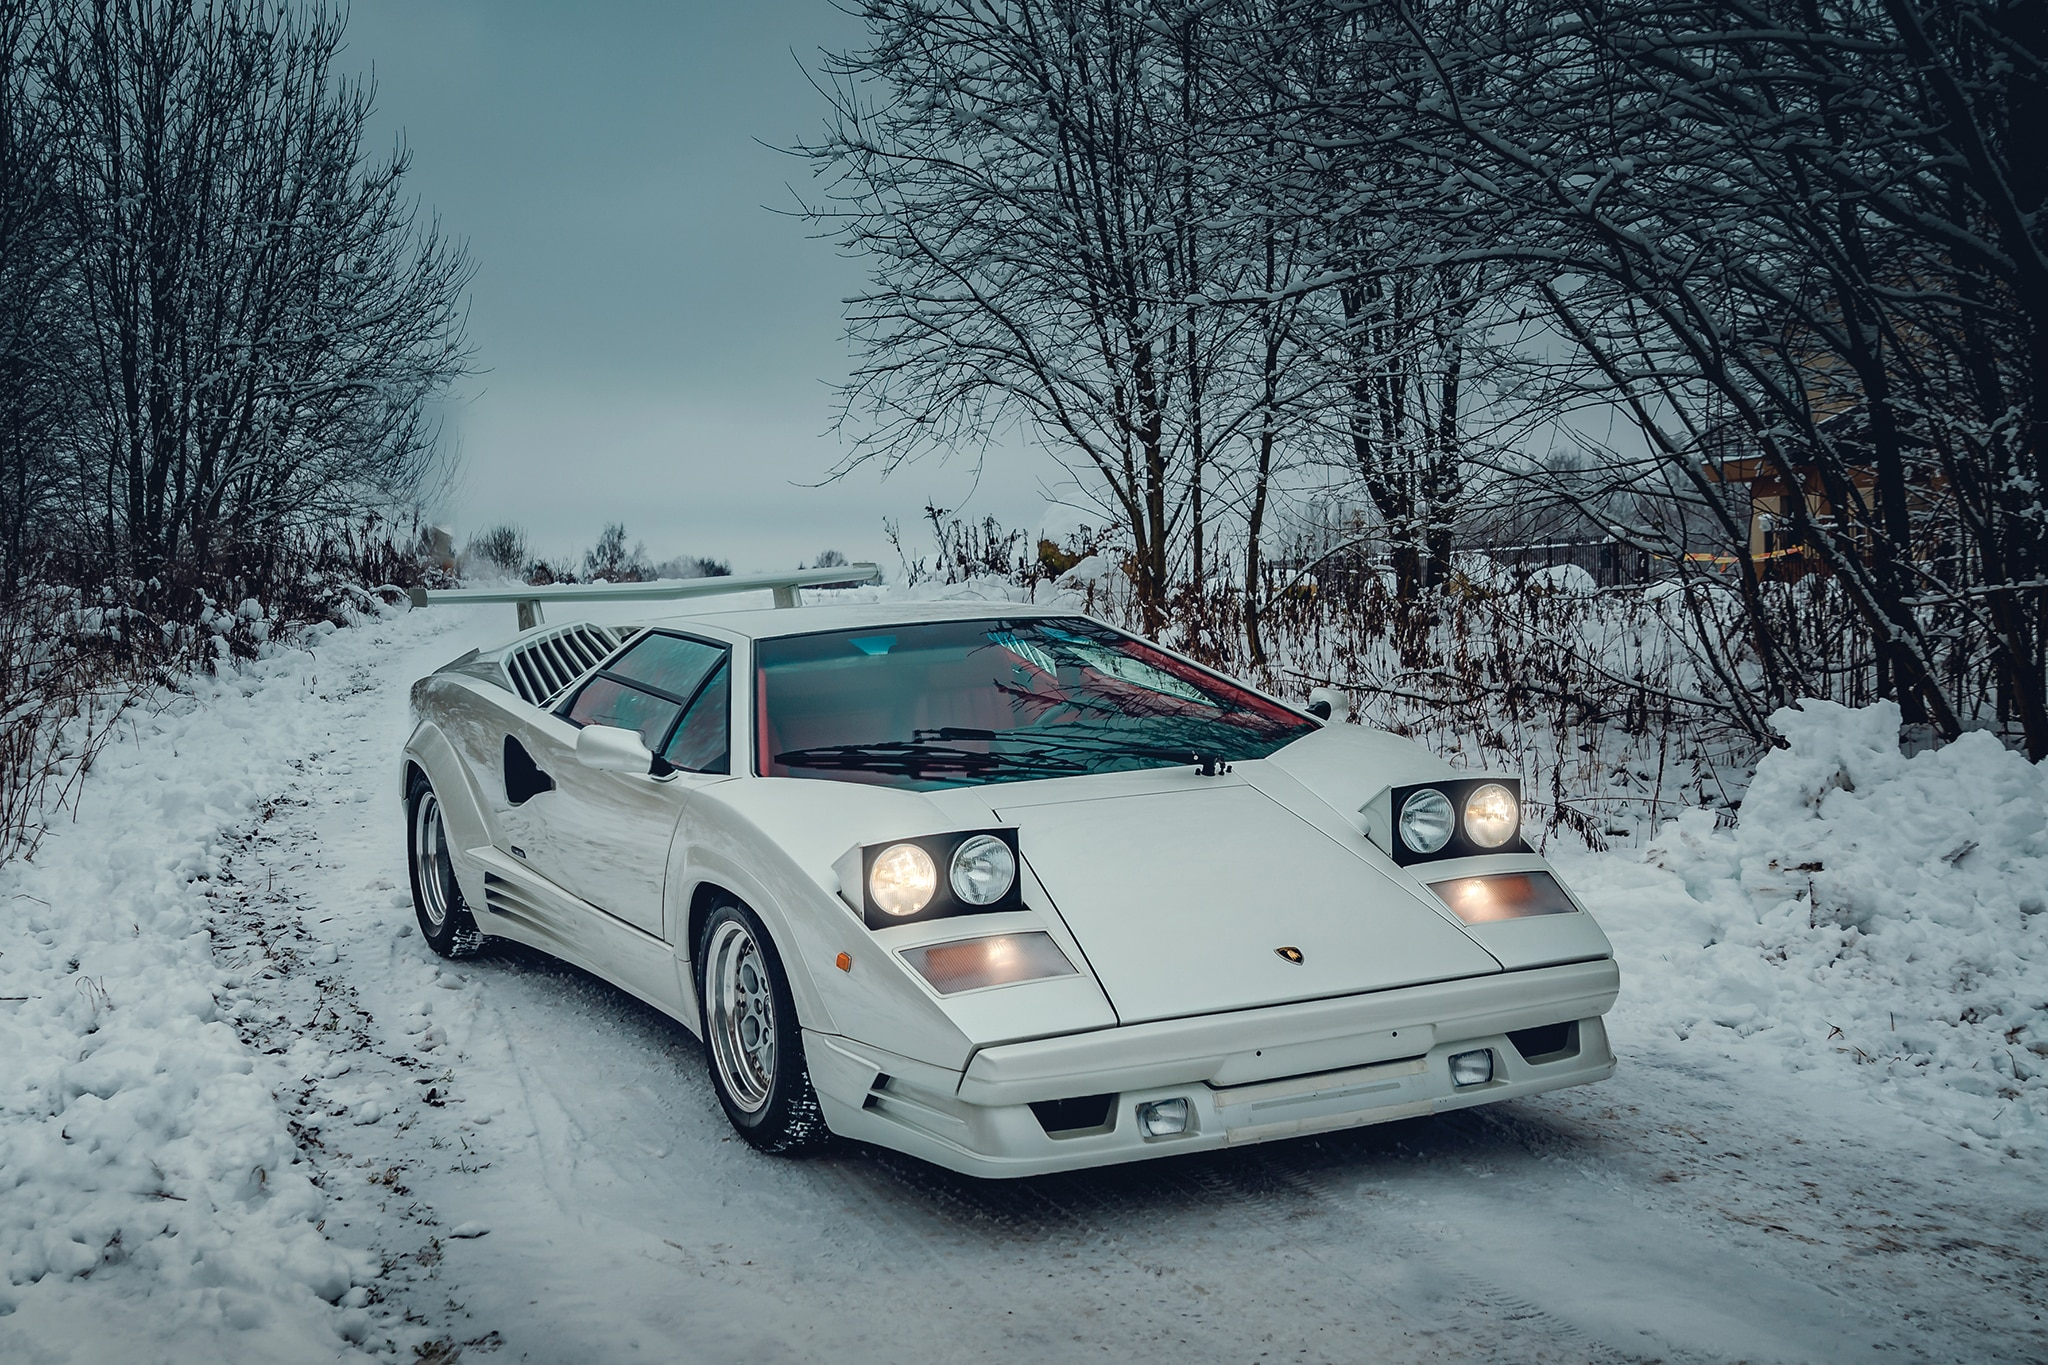 1991 Lamborghini Countach 25th Anniversary RM Sothebys Front Three Quarters